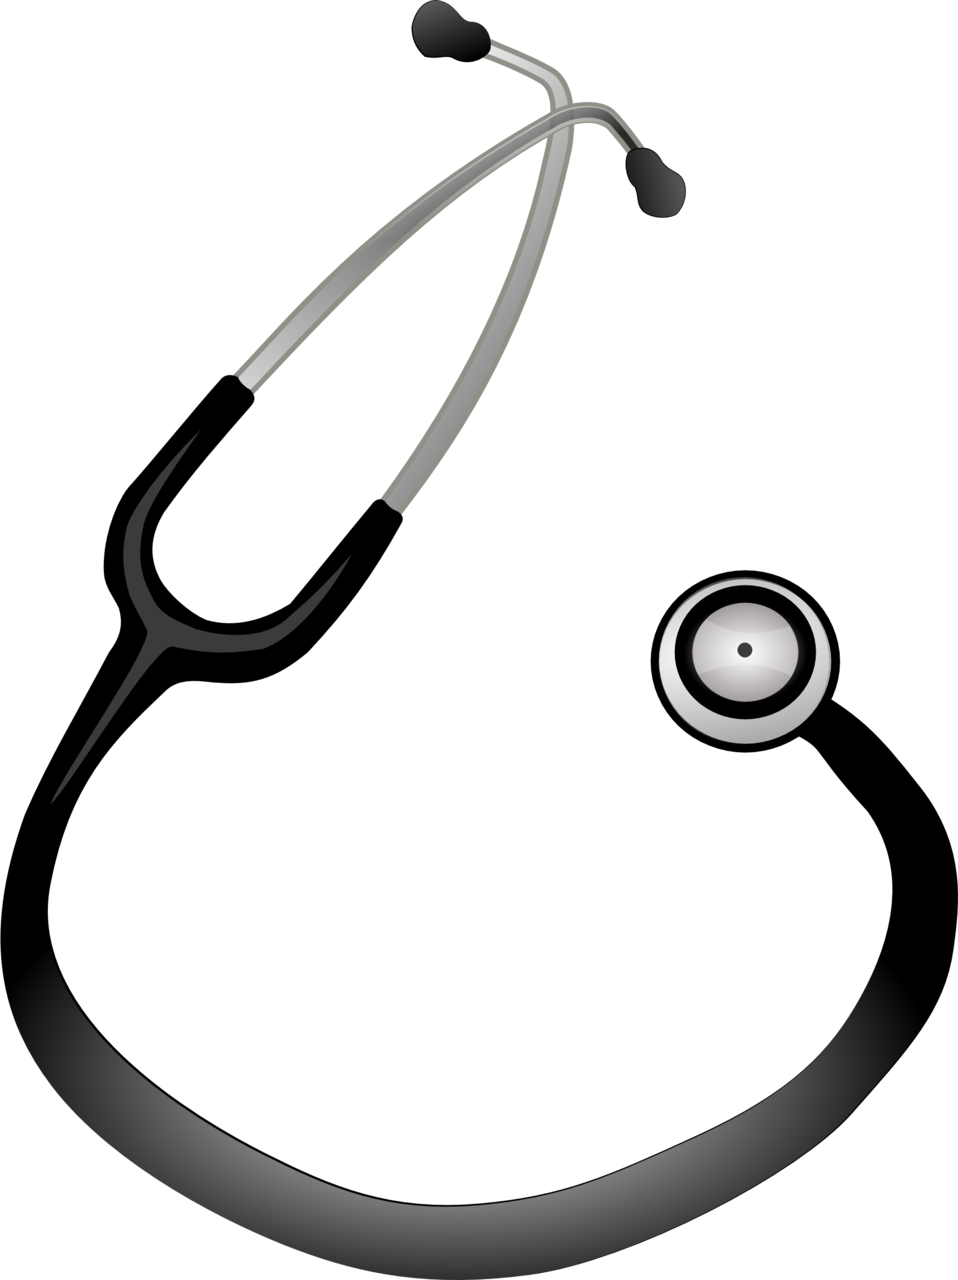 Medicine clipart medical condition. Public domain clip art